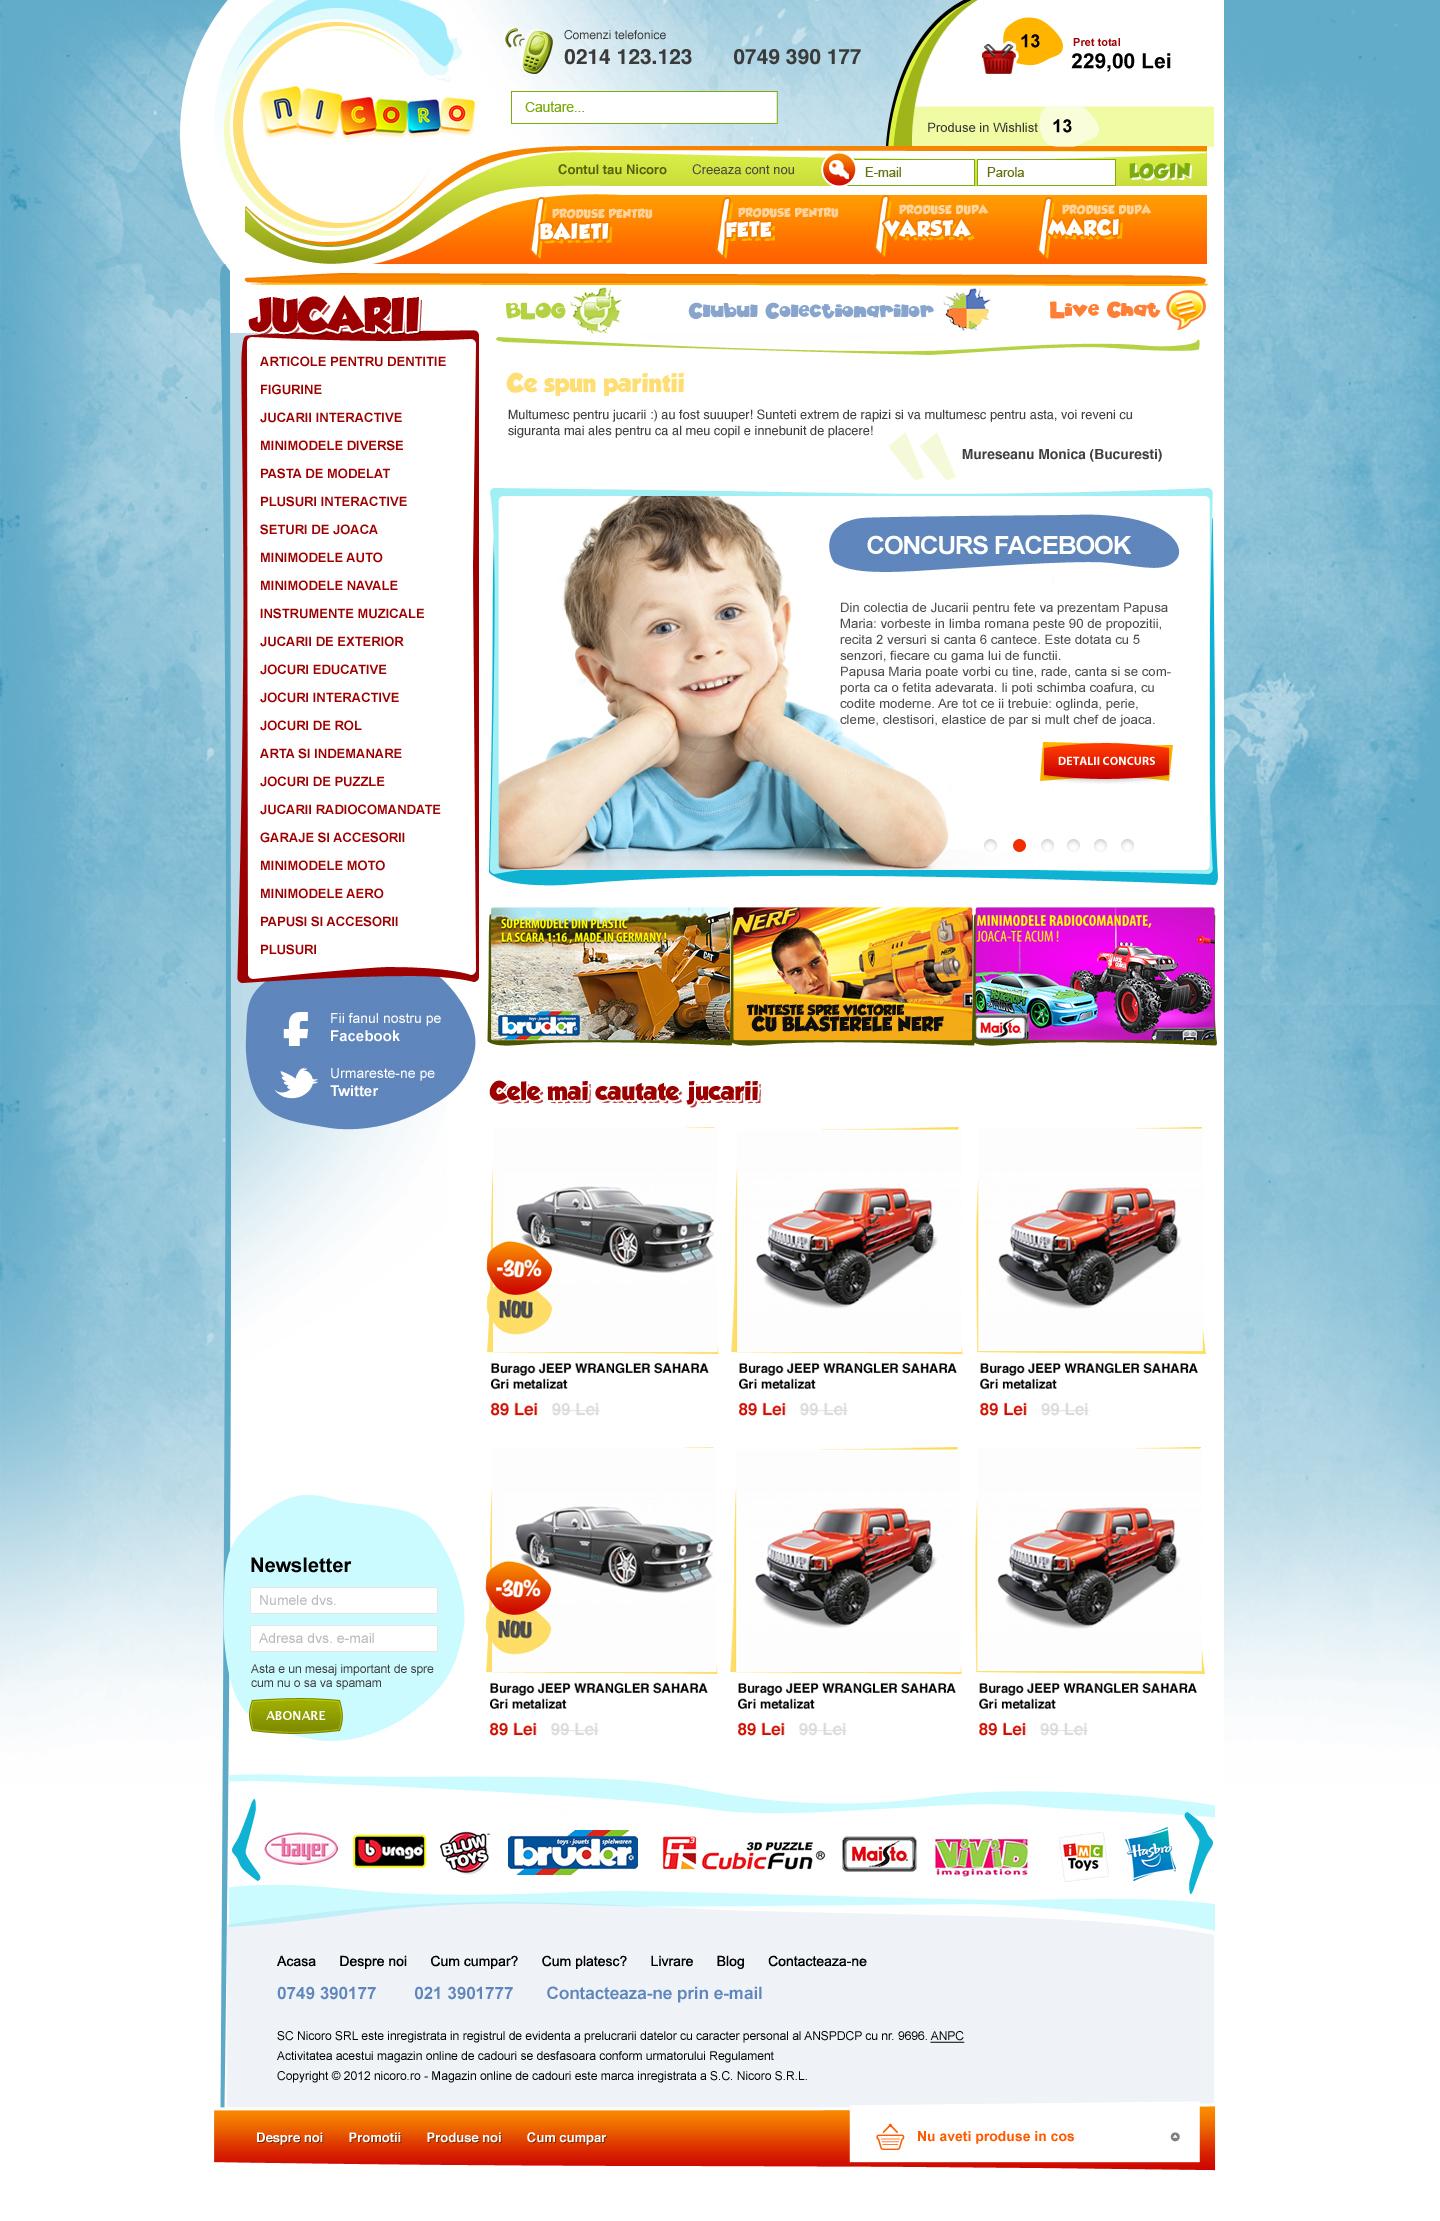 01-Nicoro-homepage